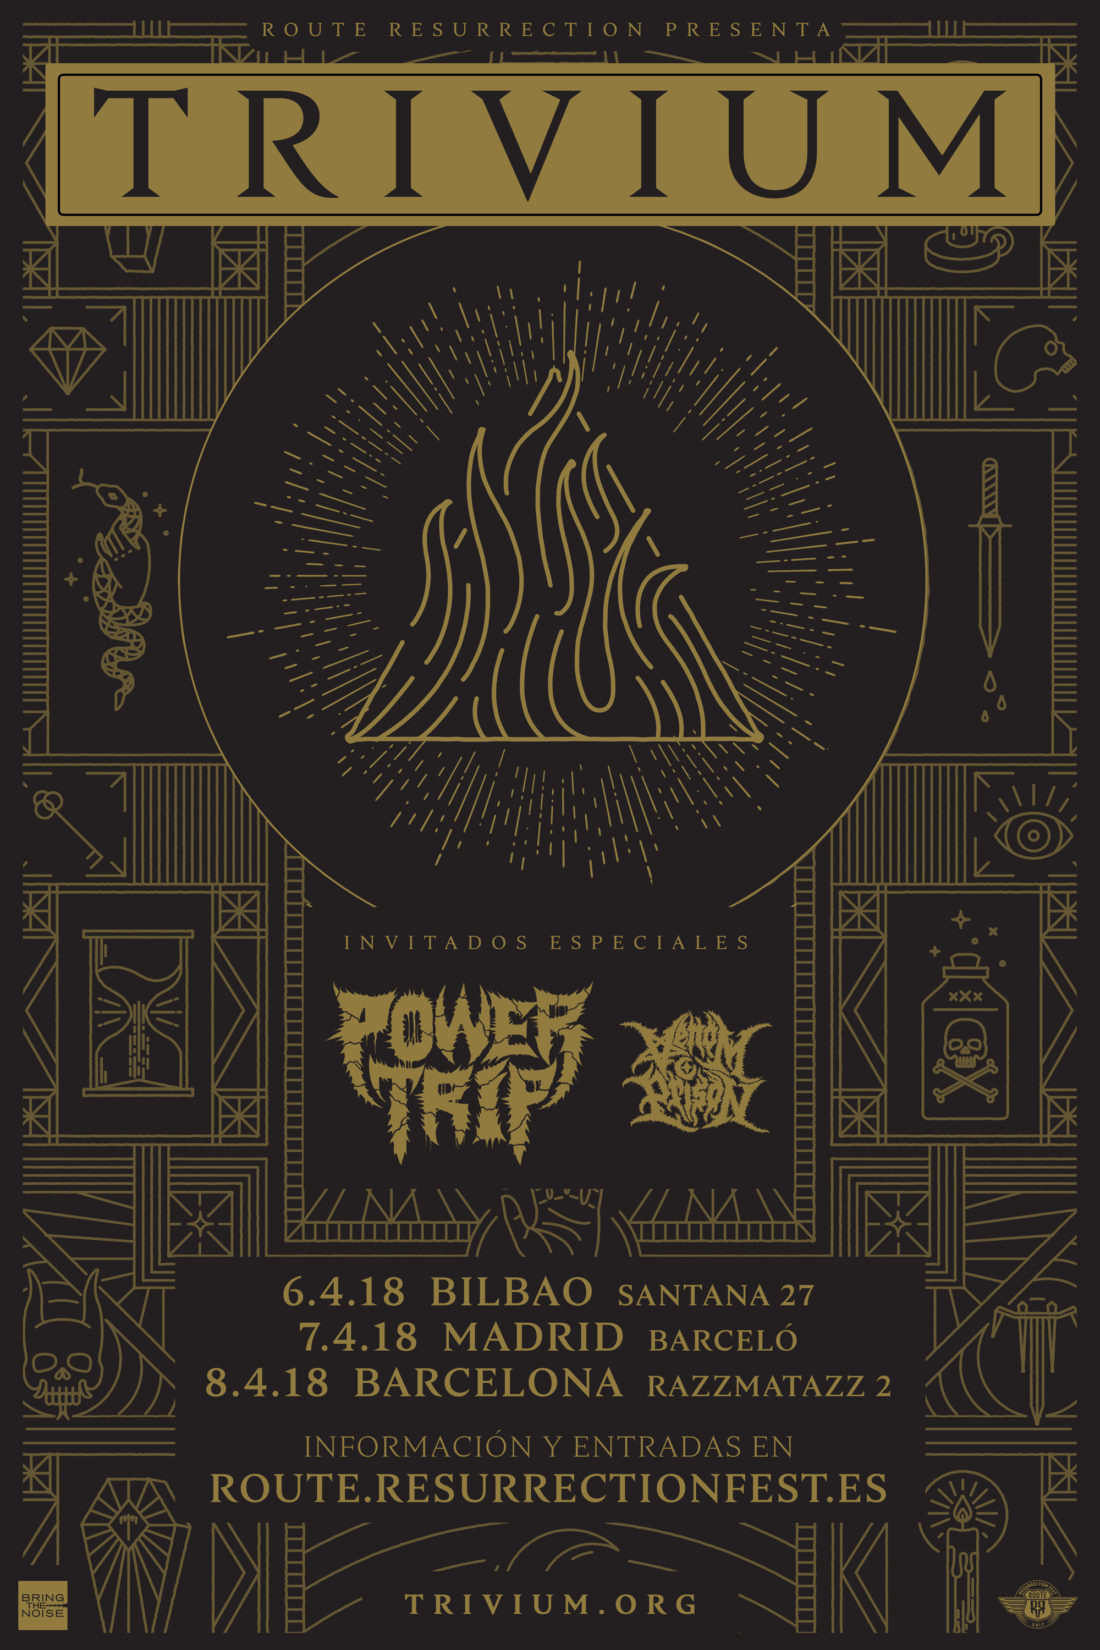 Nueva gira Route Resurrection: ¡Trivium regresan a España con nuevo disco!